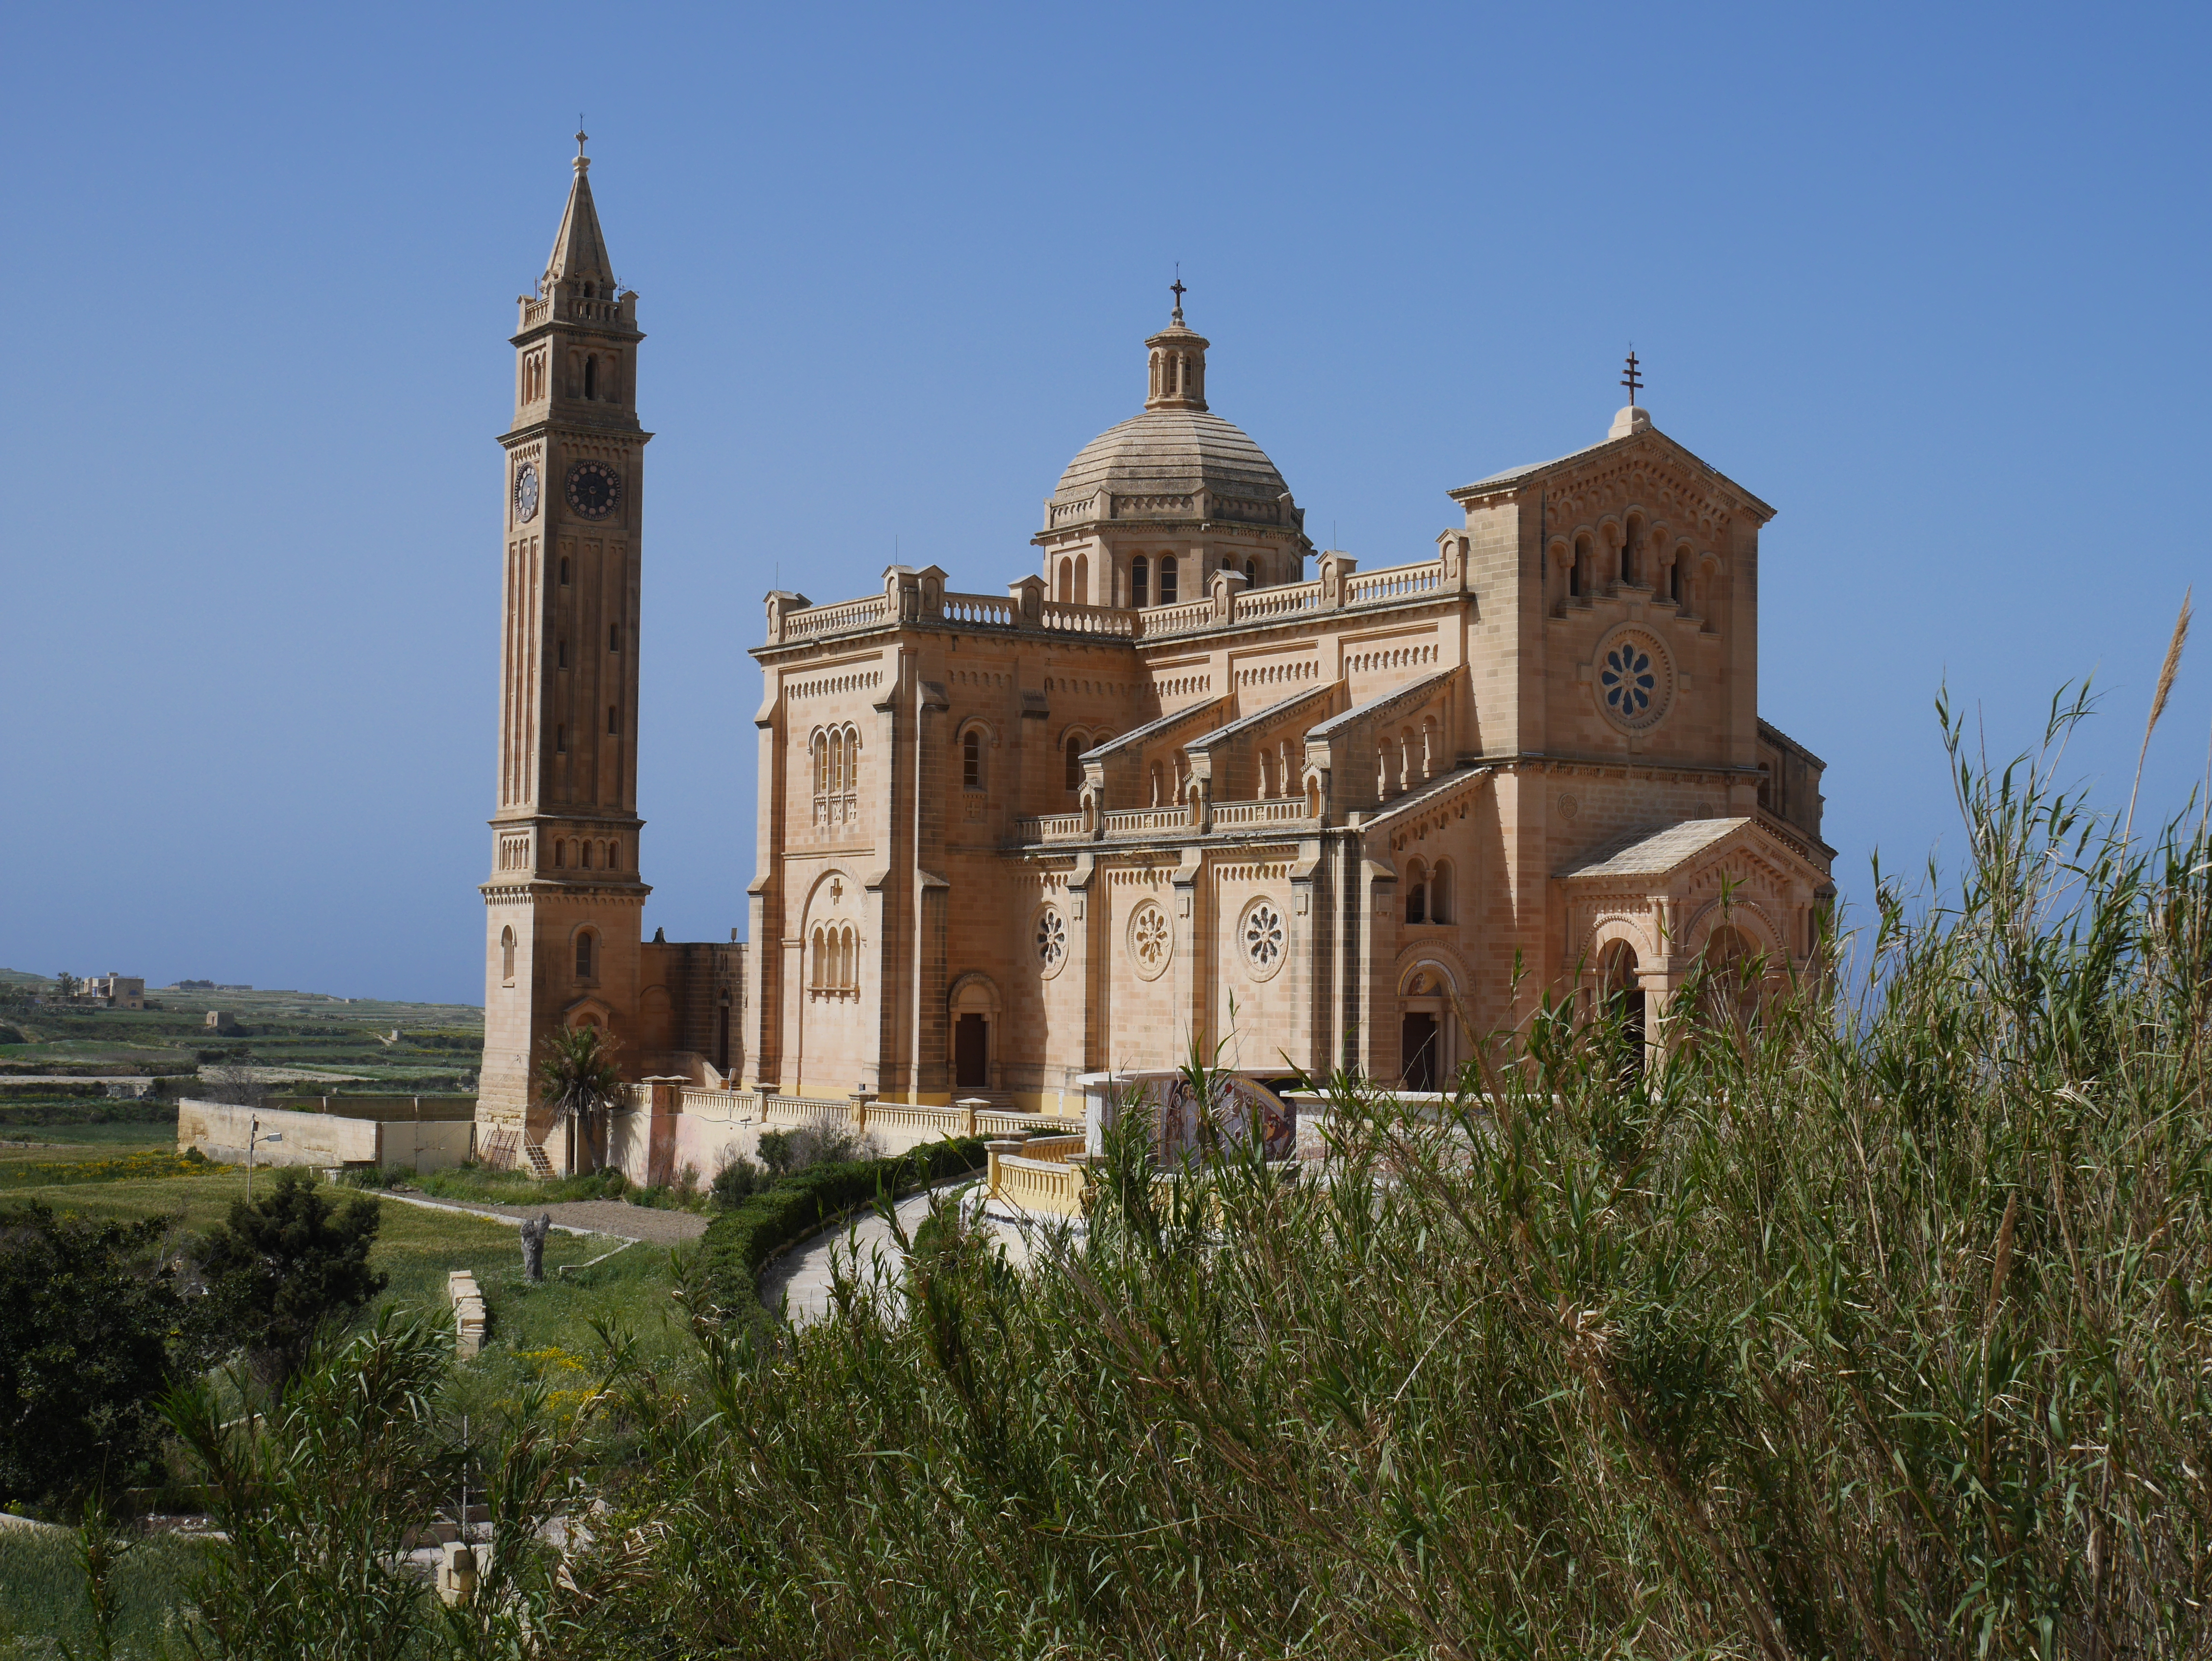 Malta Gozo cathedral